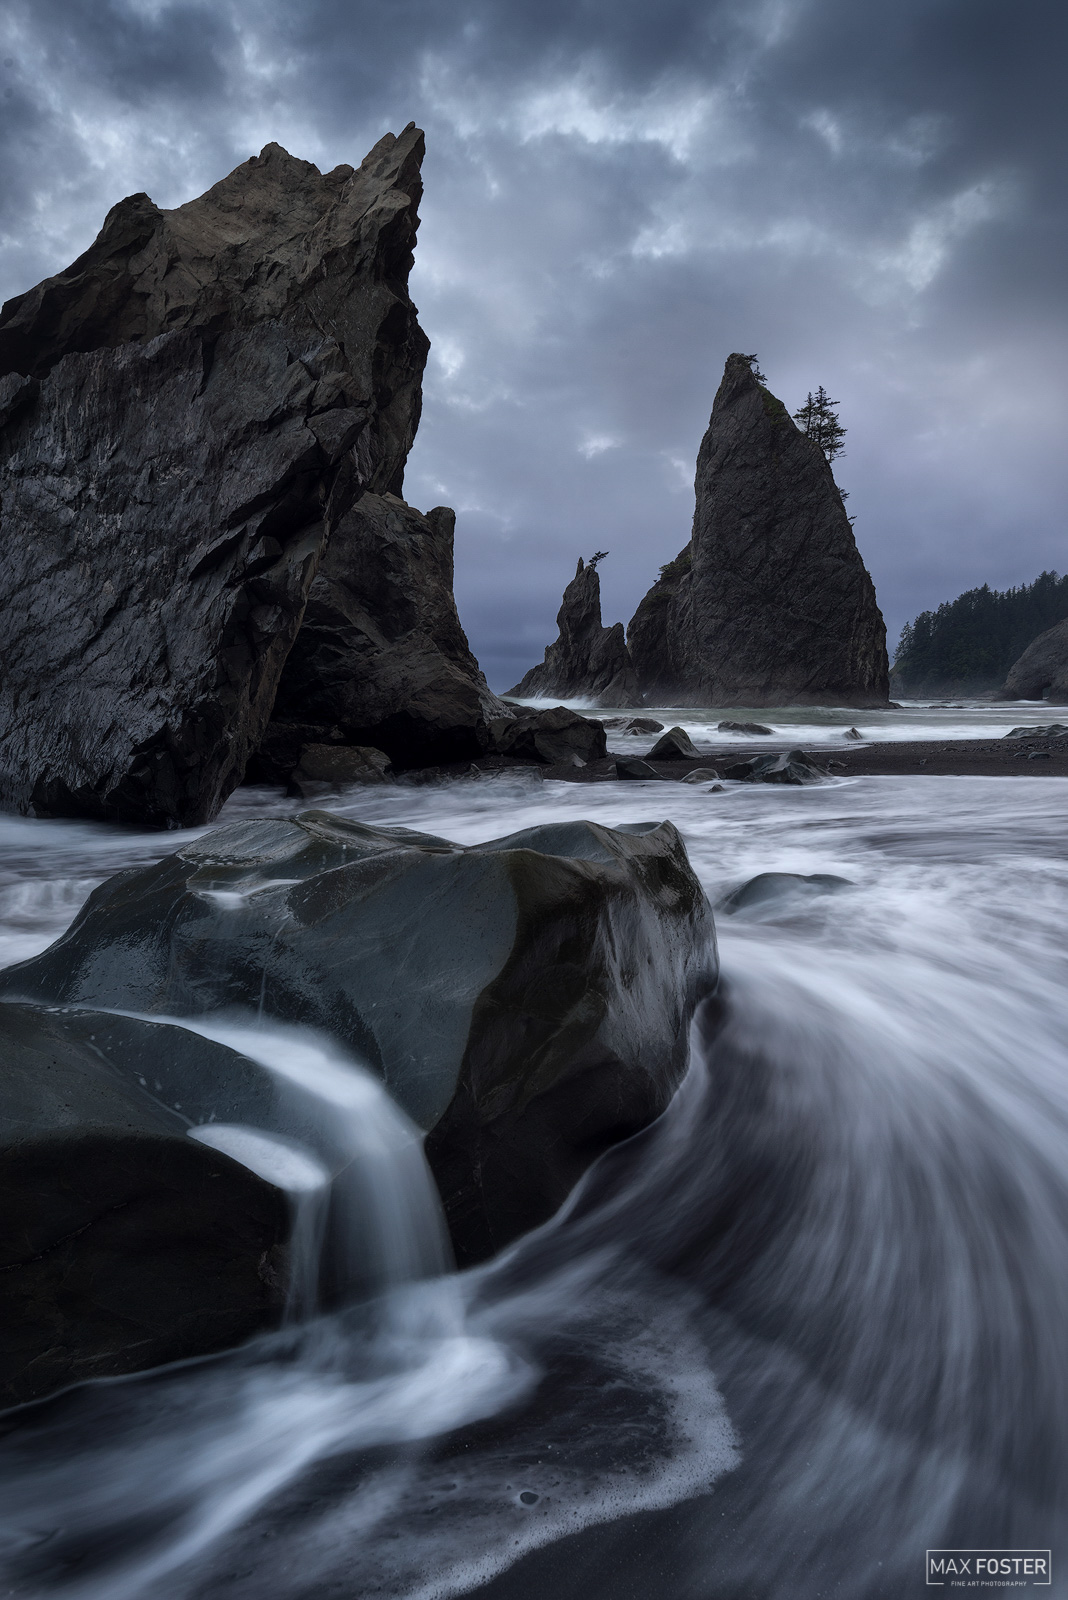 Rialto Beach, Olympic National Park, Washington, Awaken, Pacific Ocean, Quillayute River, photo